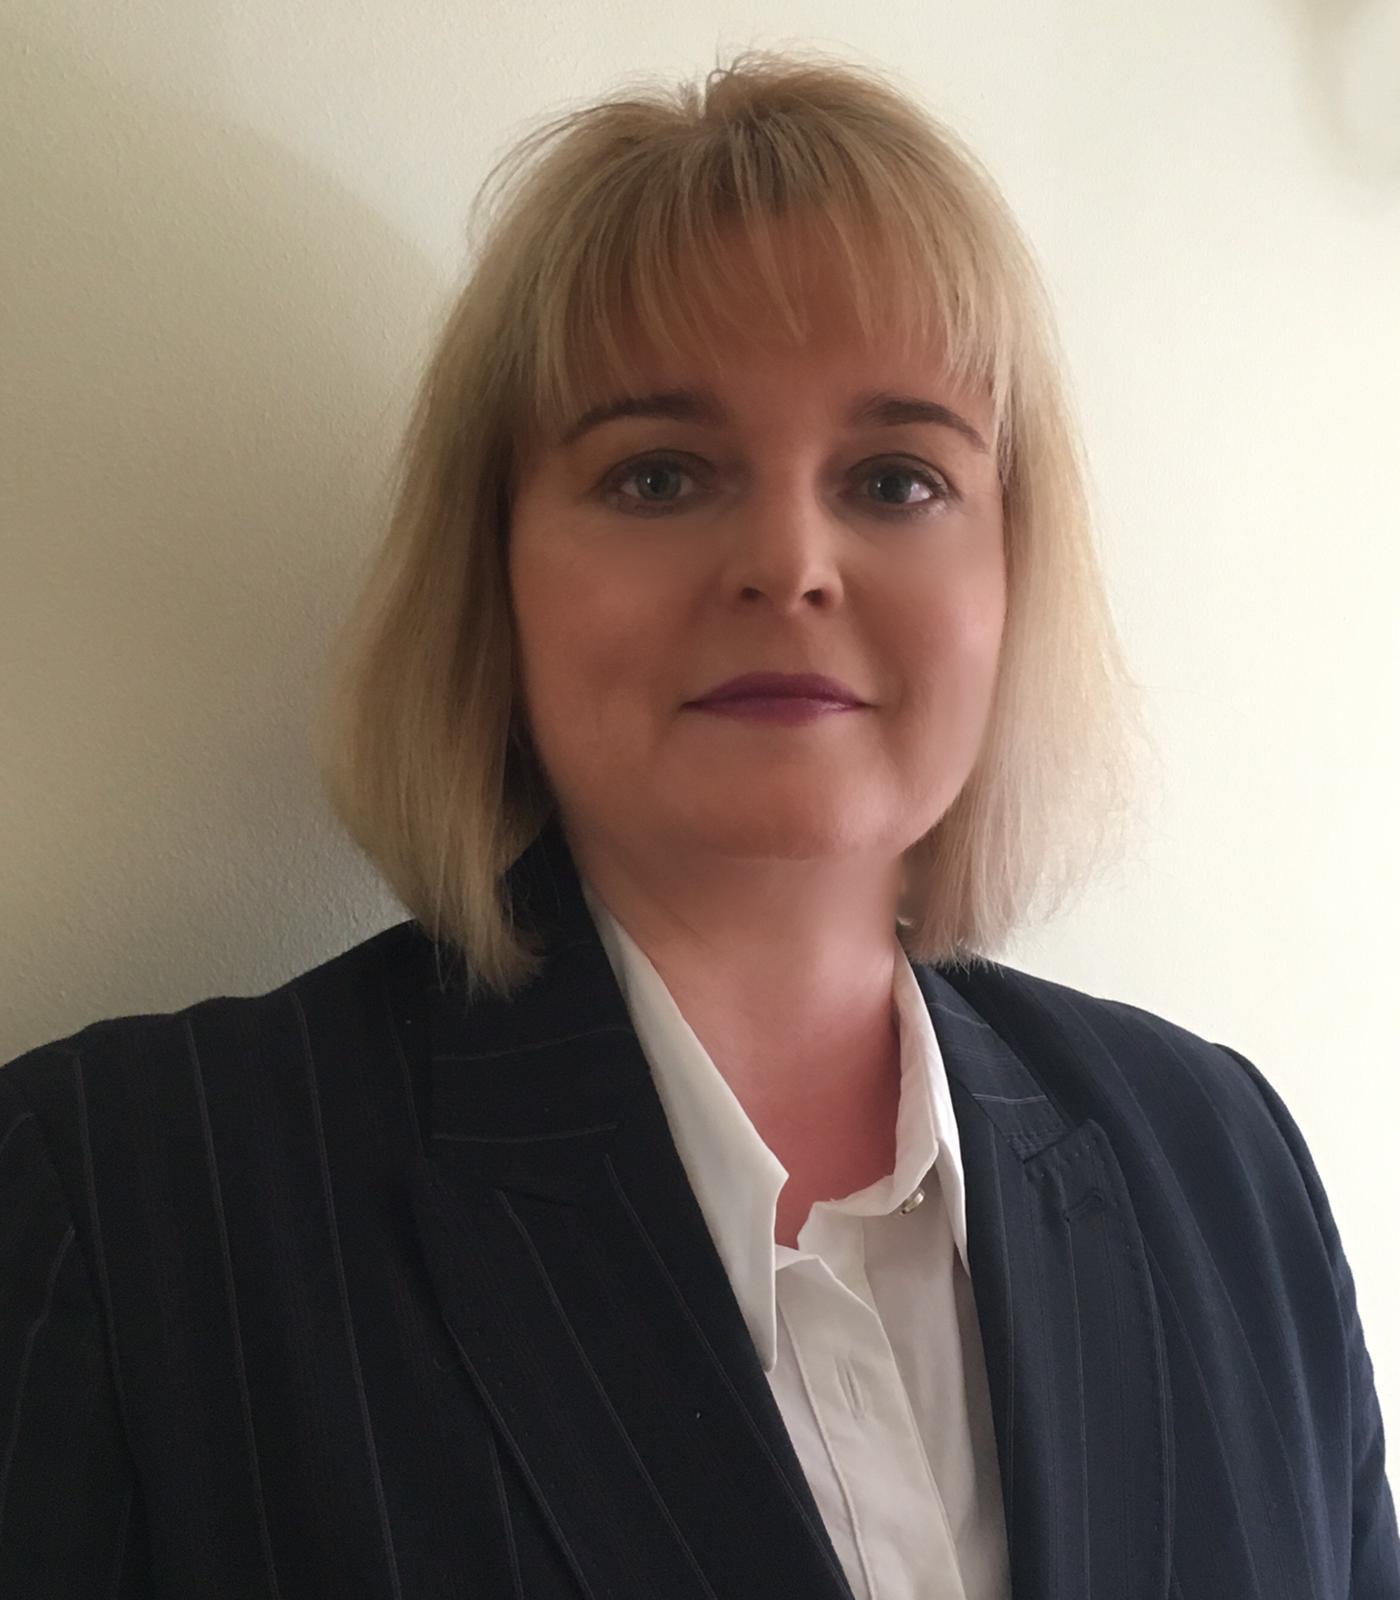 Nikki West, BSc (Hons), CMPP